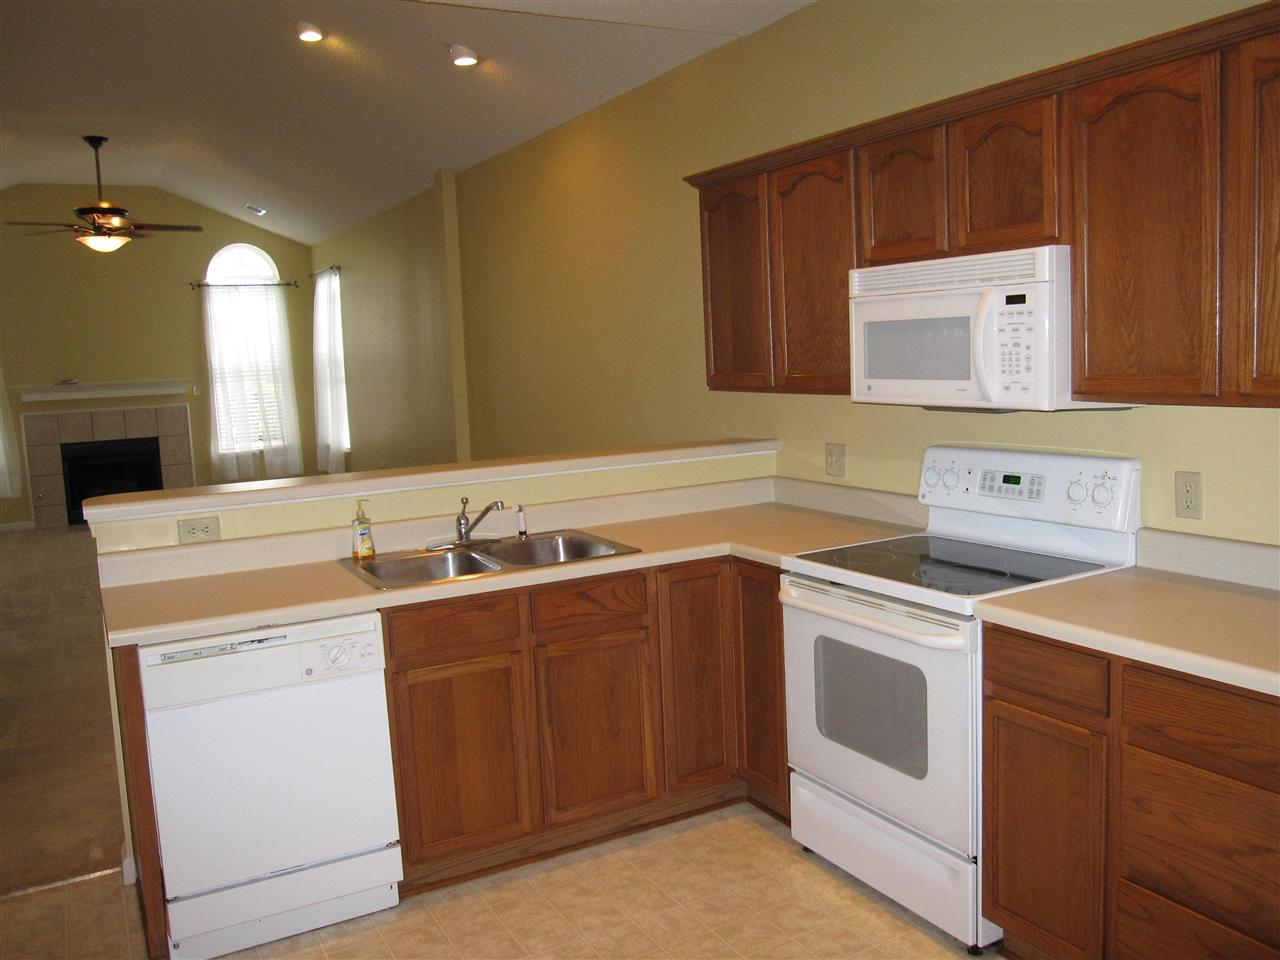 1131 Oak Heights Collierville, TN 38017 - MLS #: 10010546